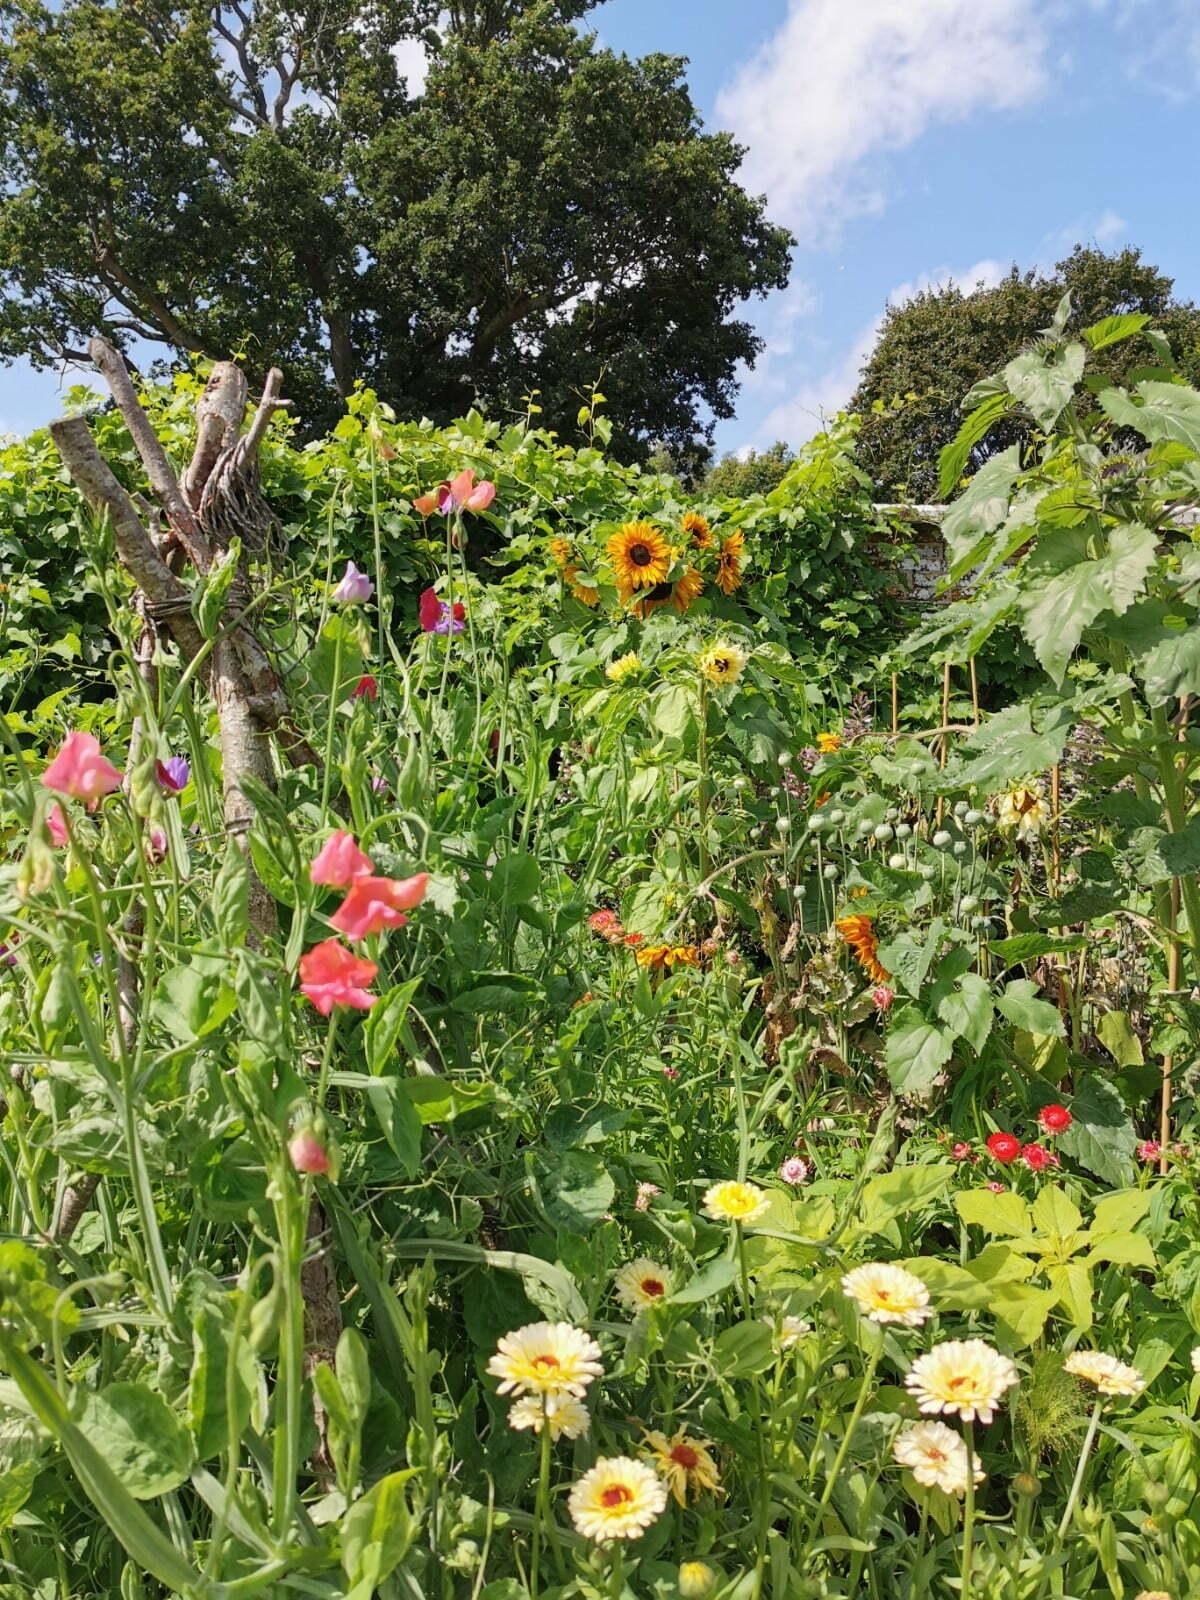 Bateman's Garden: A Kaleidoscope of Colours at Rudyard Kipling's National Trust Home 13